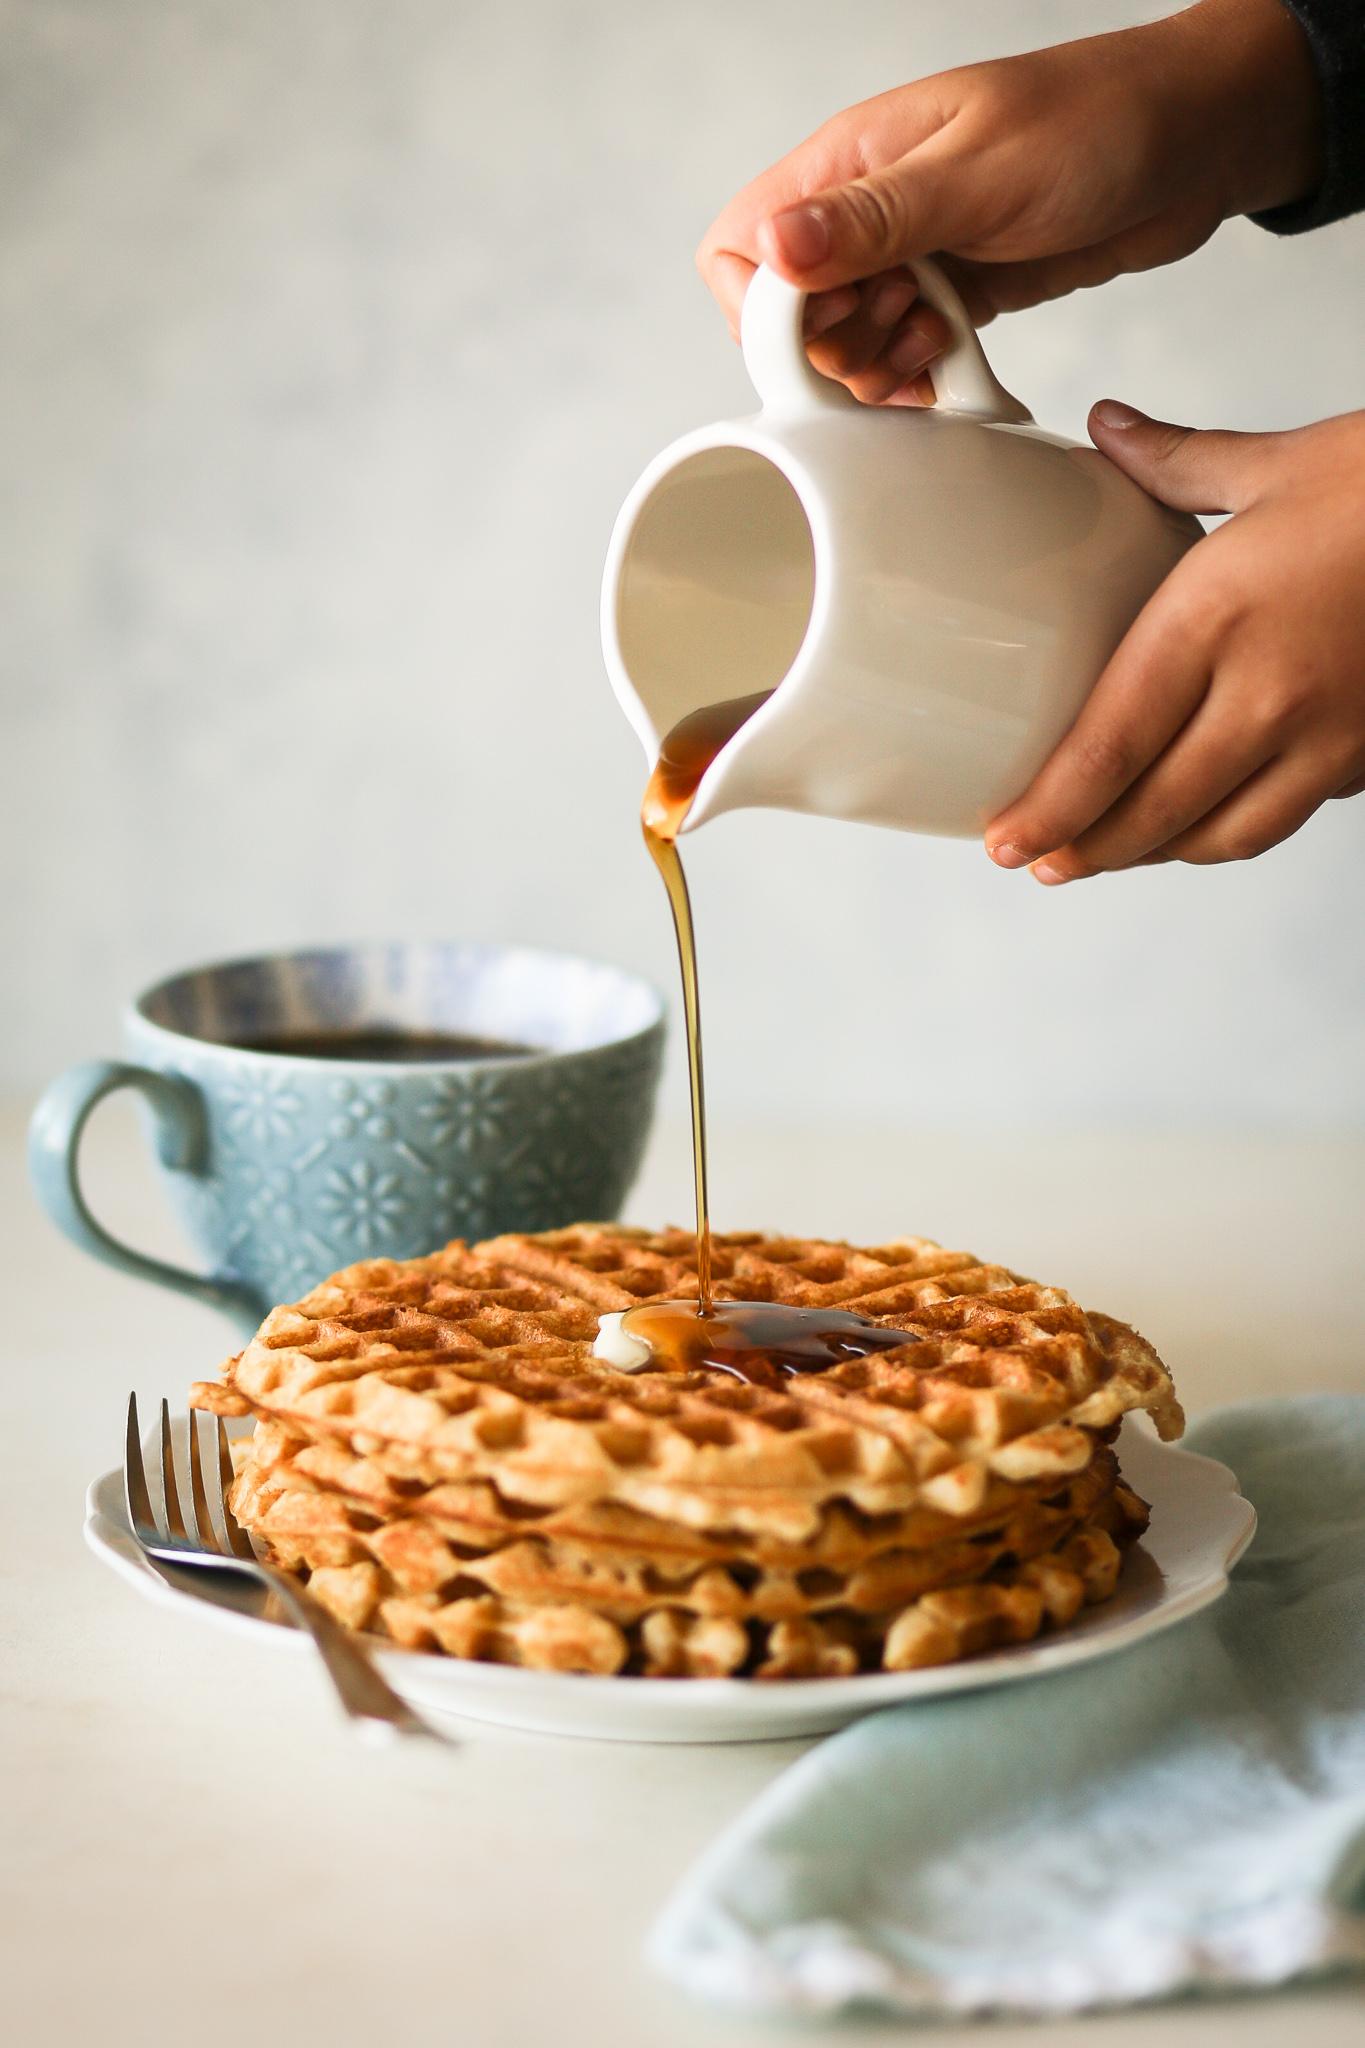 Brown Butter Vanilla Waffles | Set the Table #waffles #wafflerecipe #breakfast #brunch #brownbutter